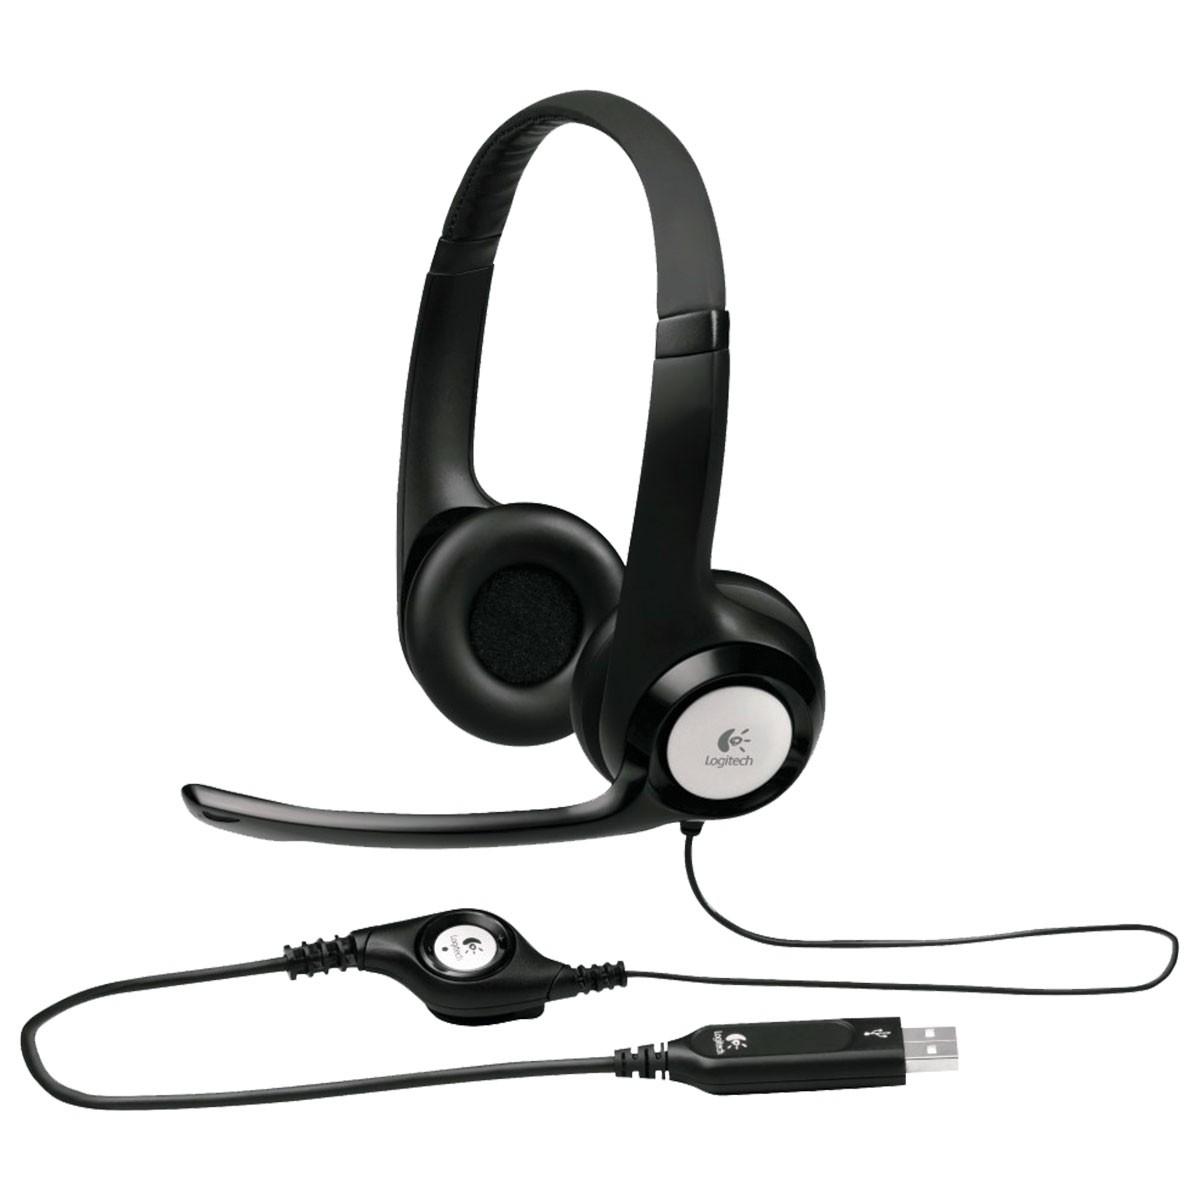 Fone com Microfone USB H390 Logitech 981-000014